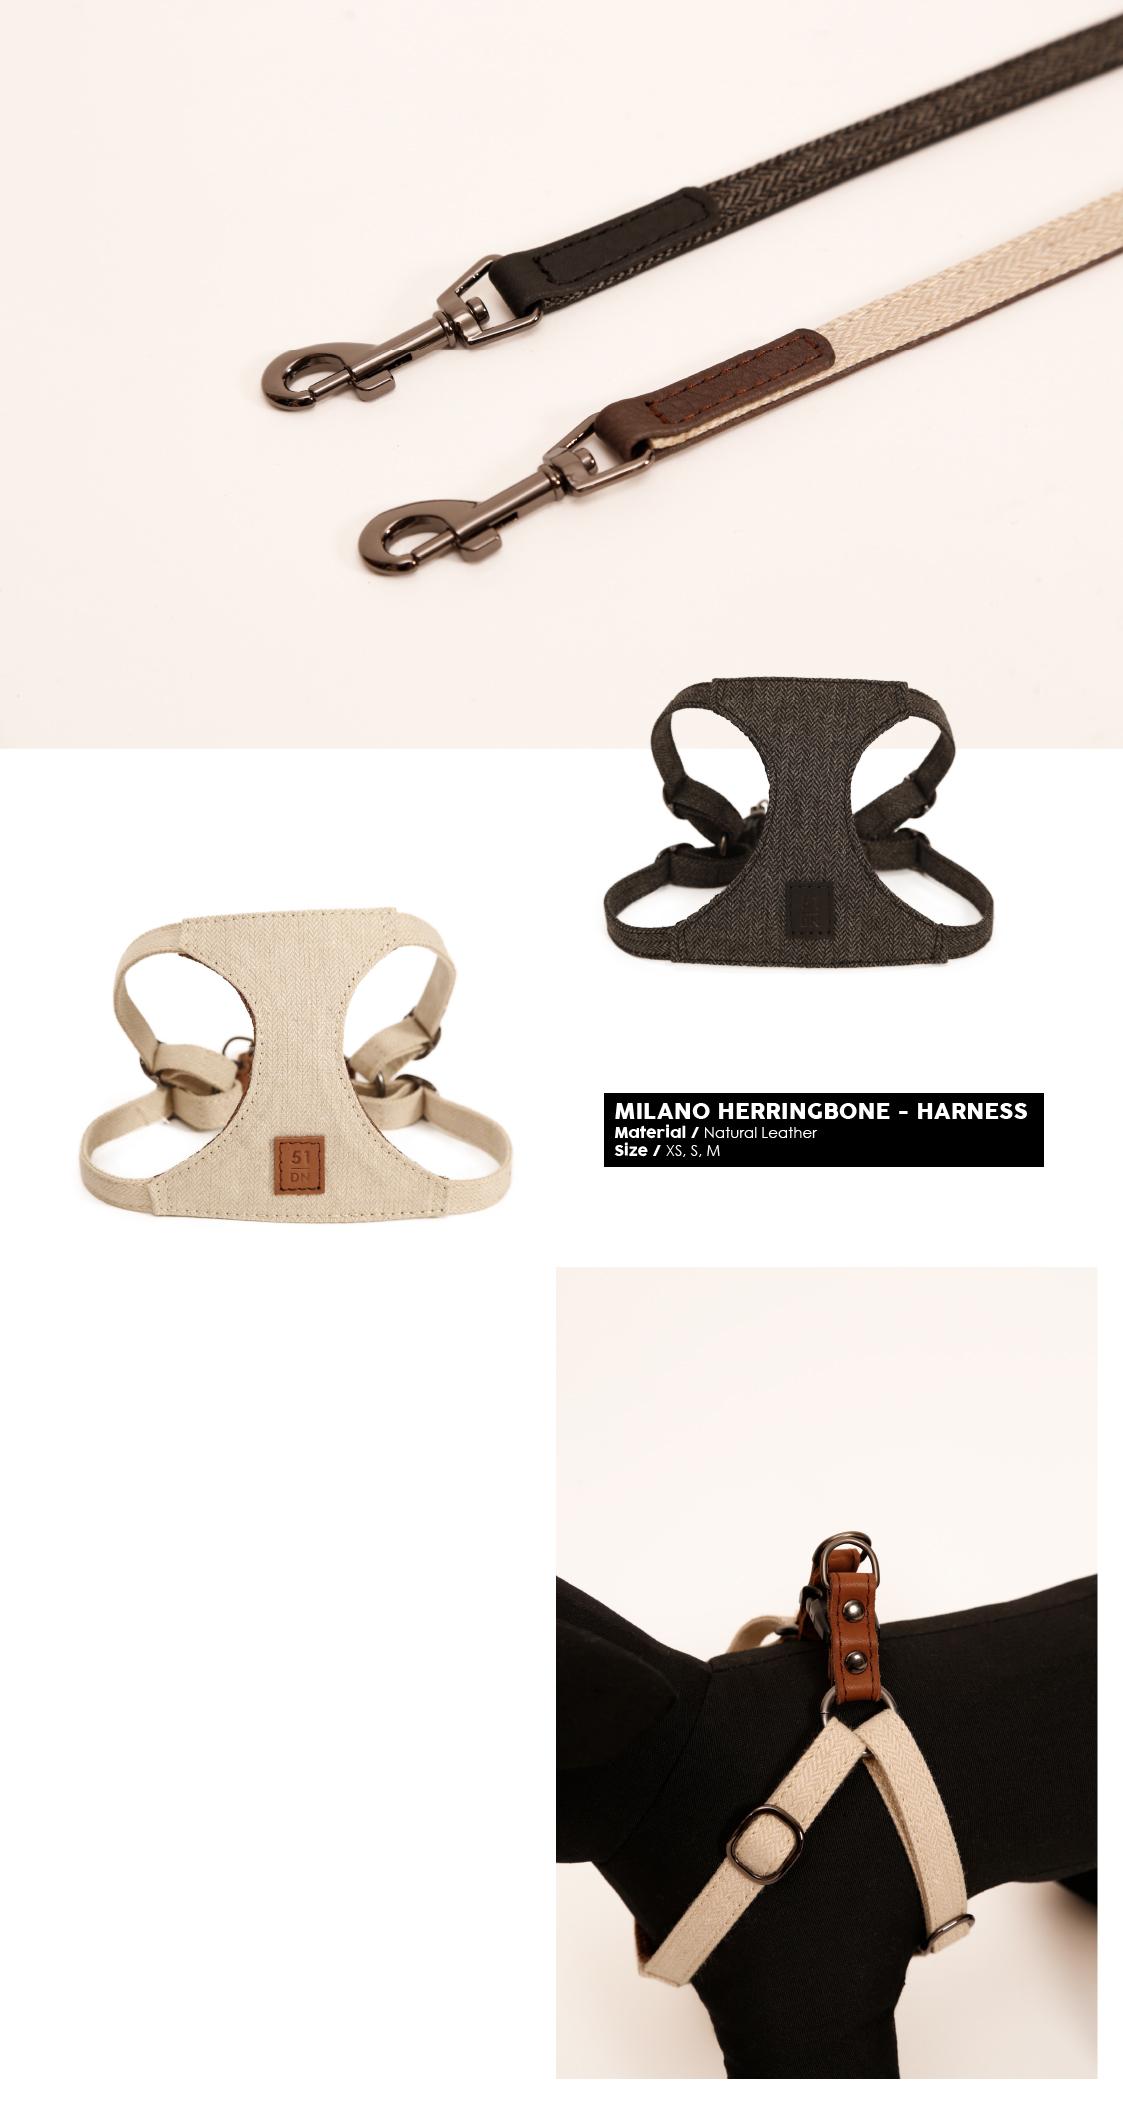 51DN - Walk - Milano Herringbone - Products2